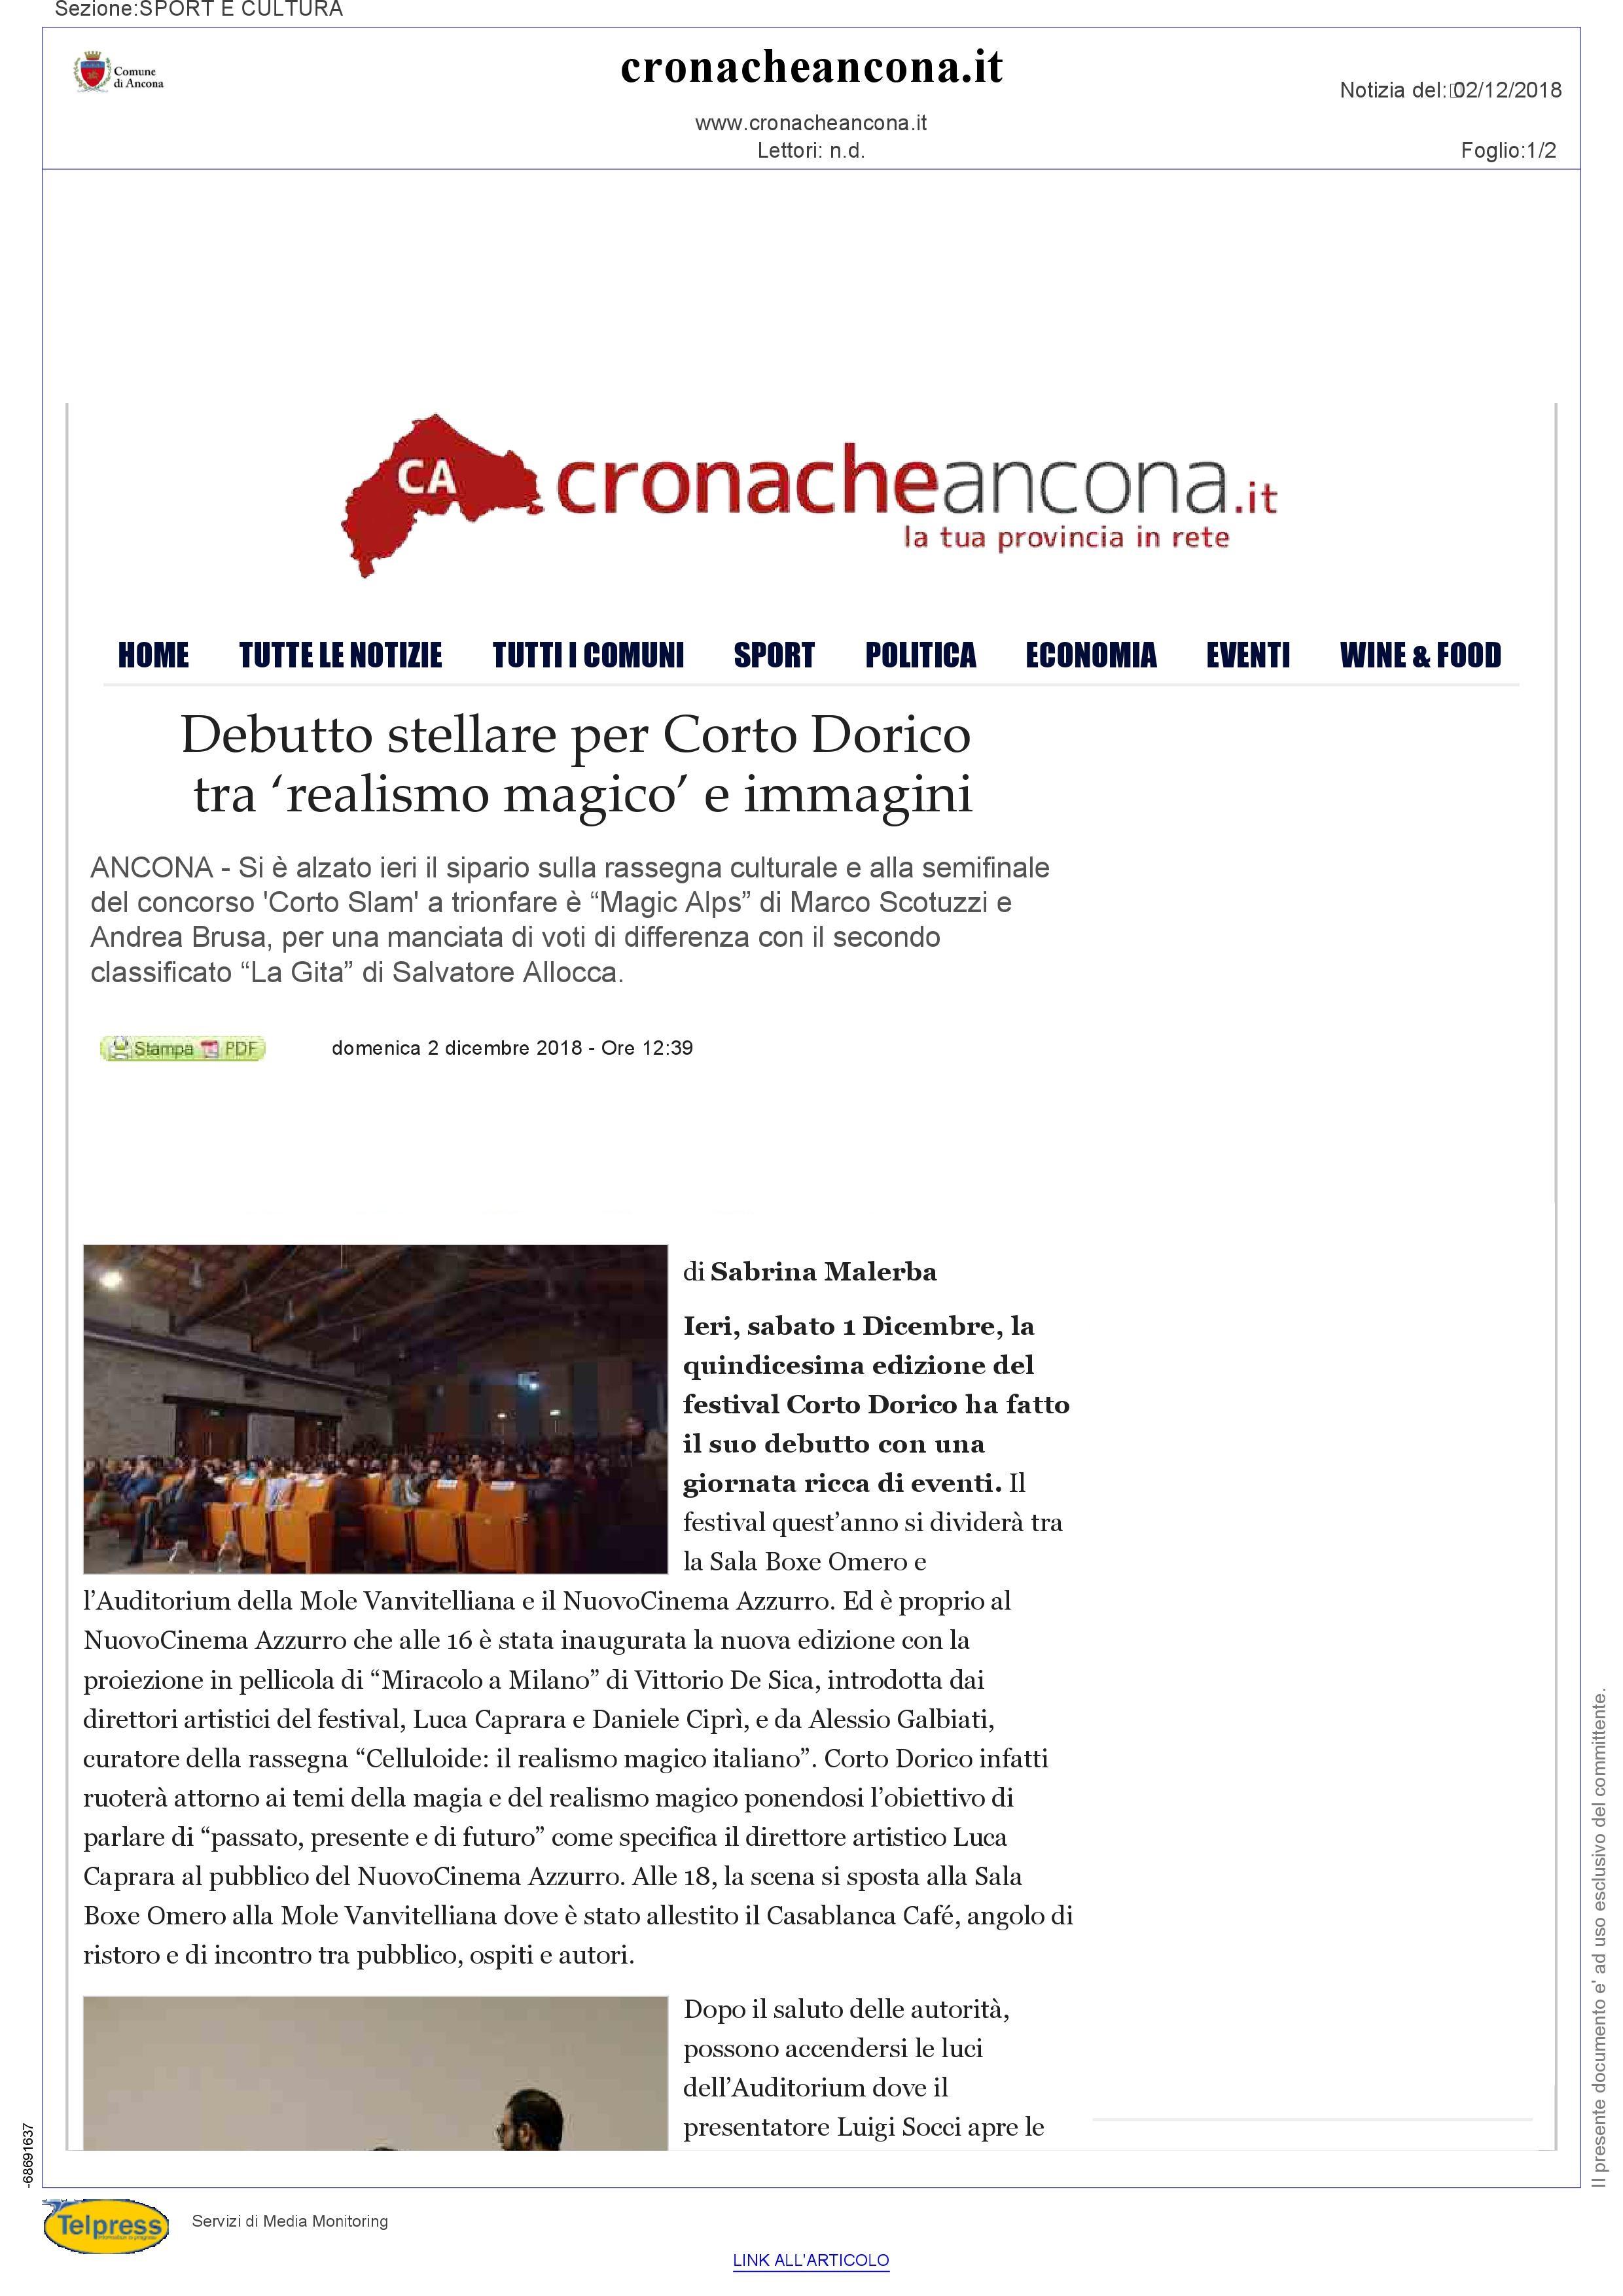 2-12-18 Cronache Ancona pag 1